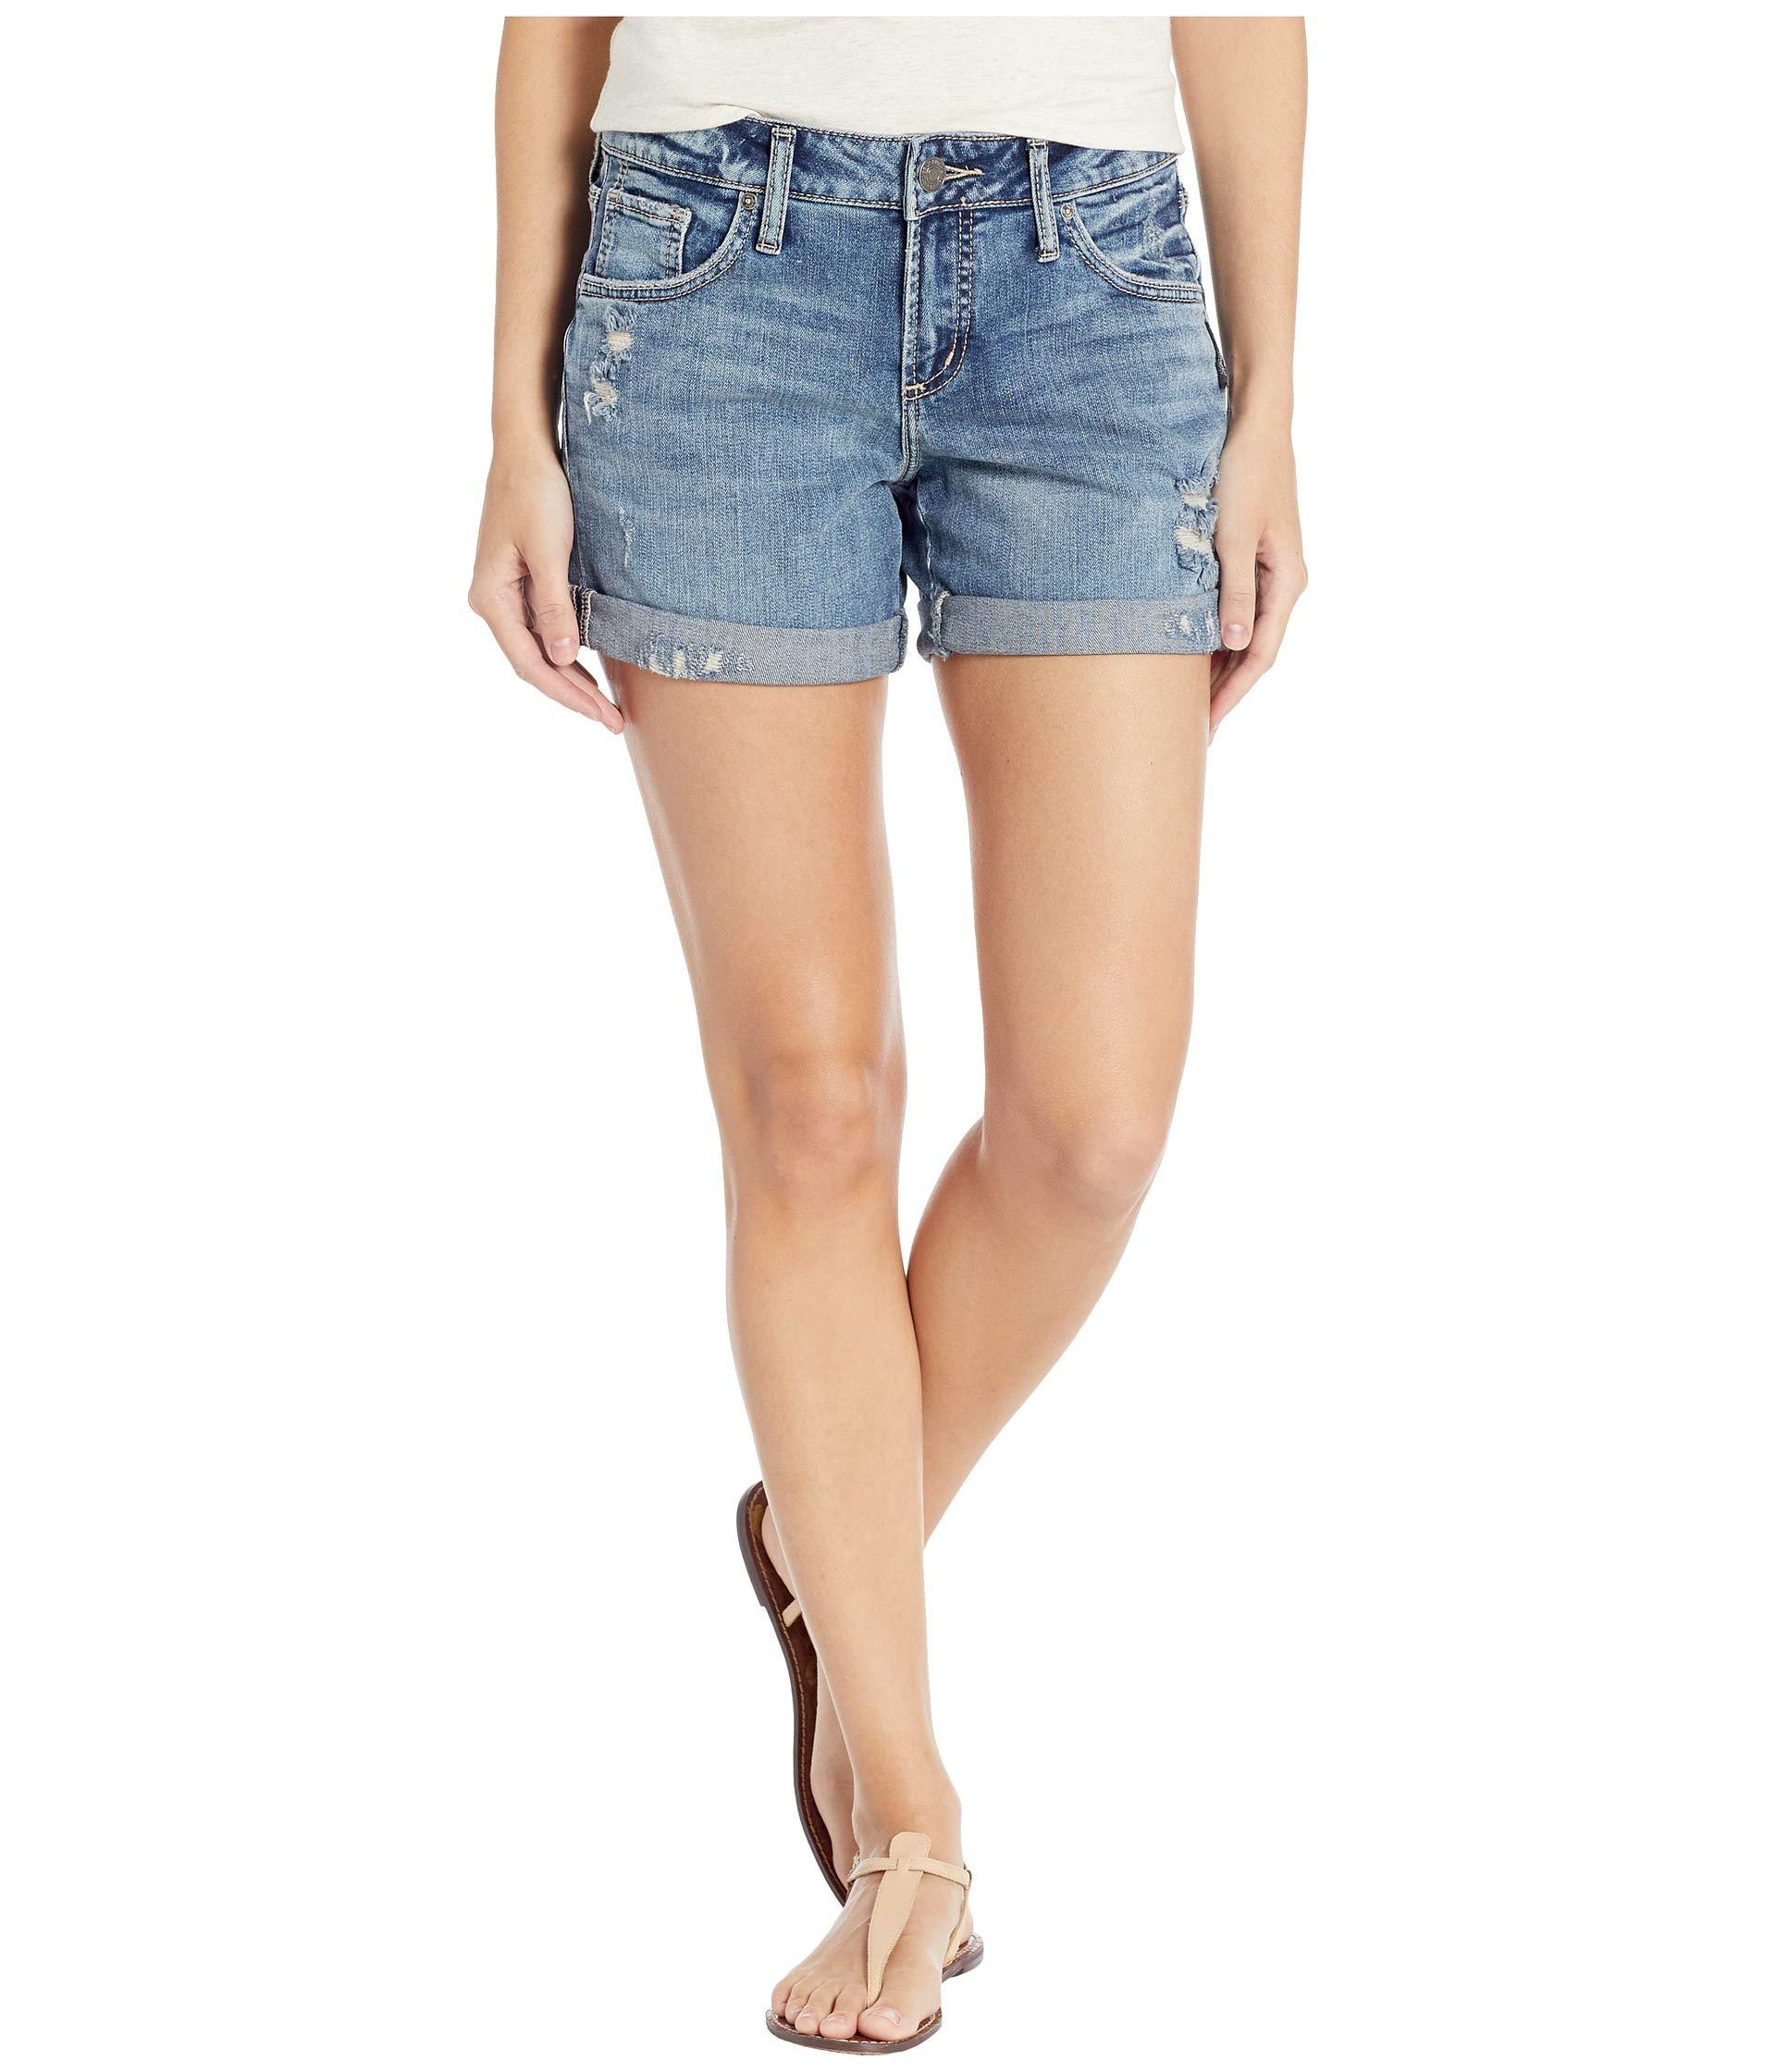 Silver Jeans Co. Women's Mid Rise Boyfriend Shorts, Medium Low Stretch, 29W x 4.5L by Silver Jeans Co.